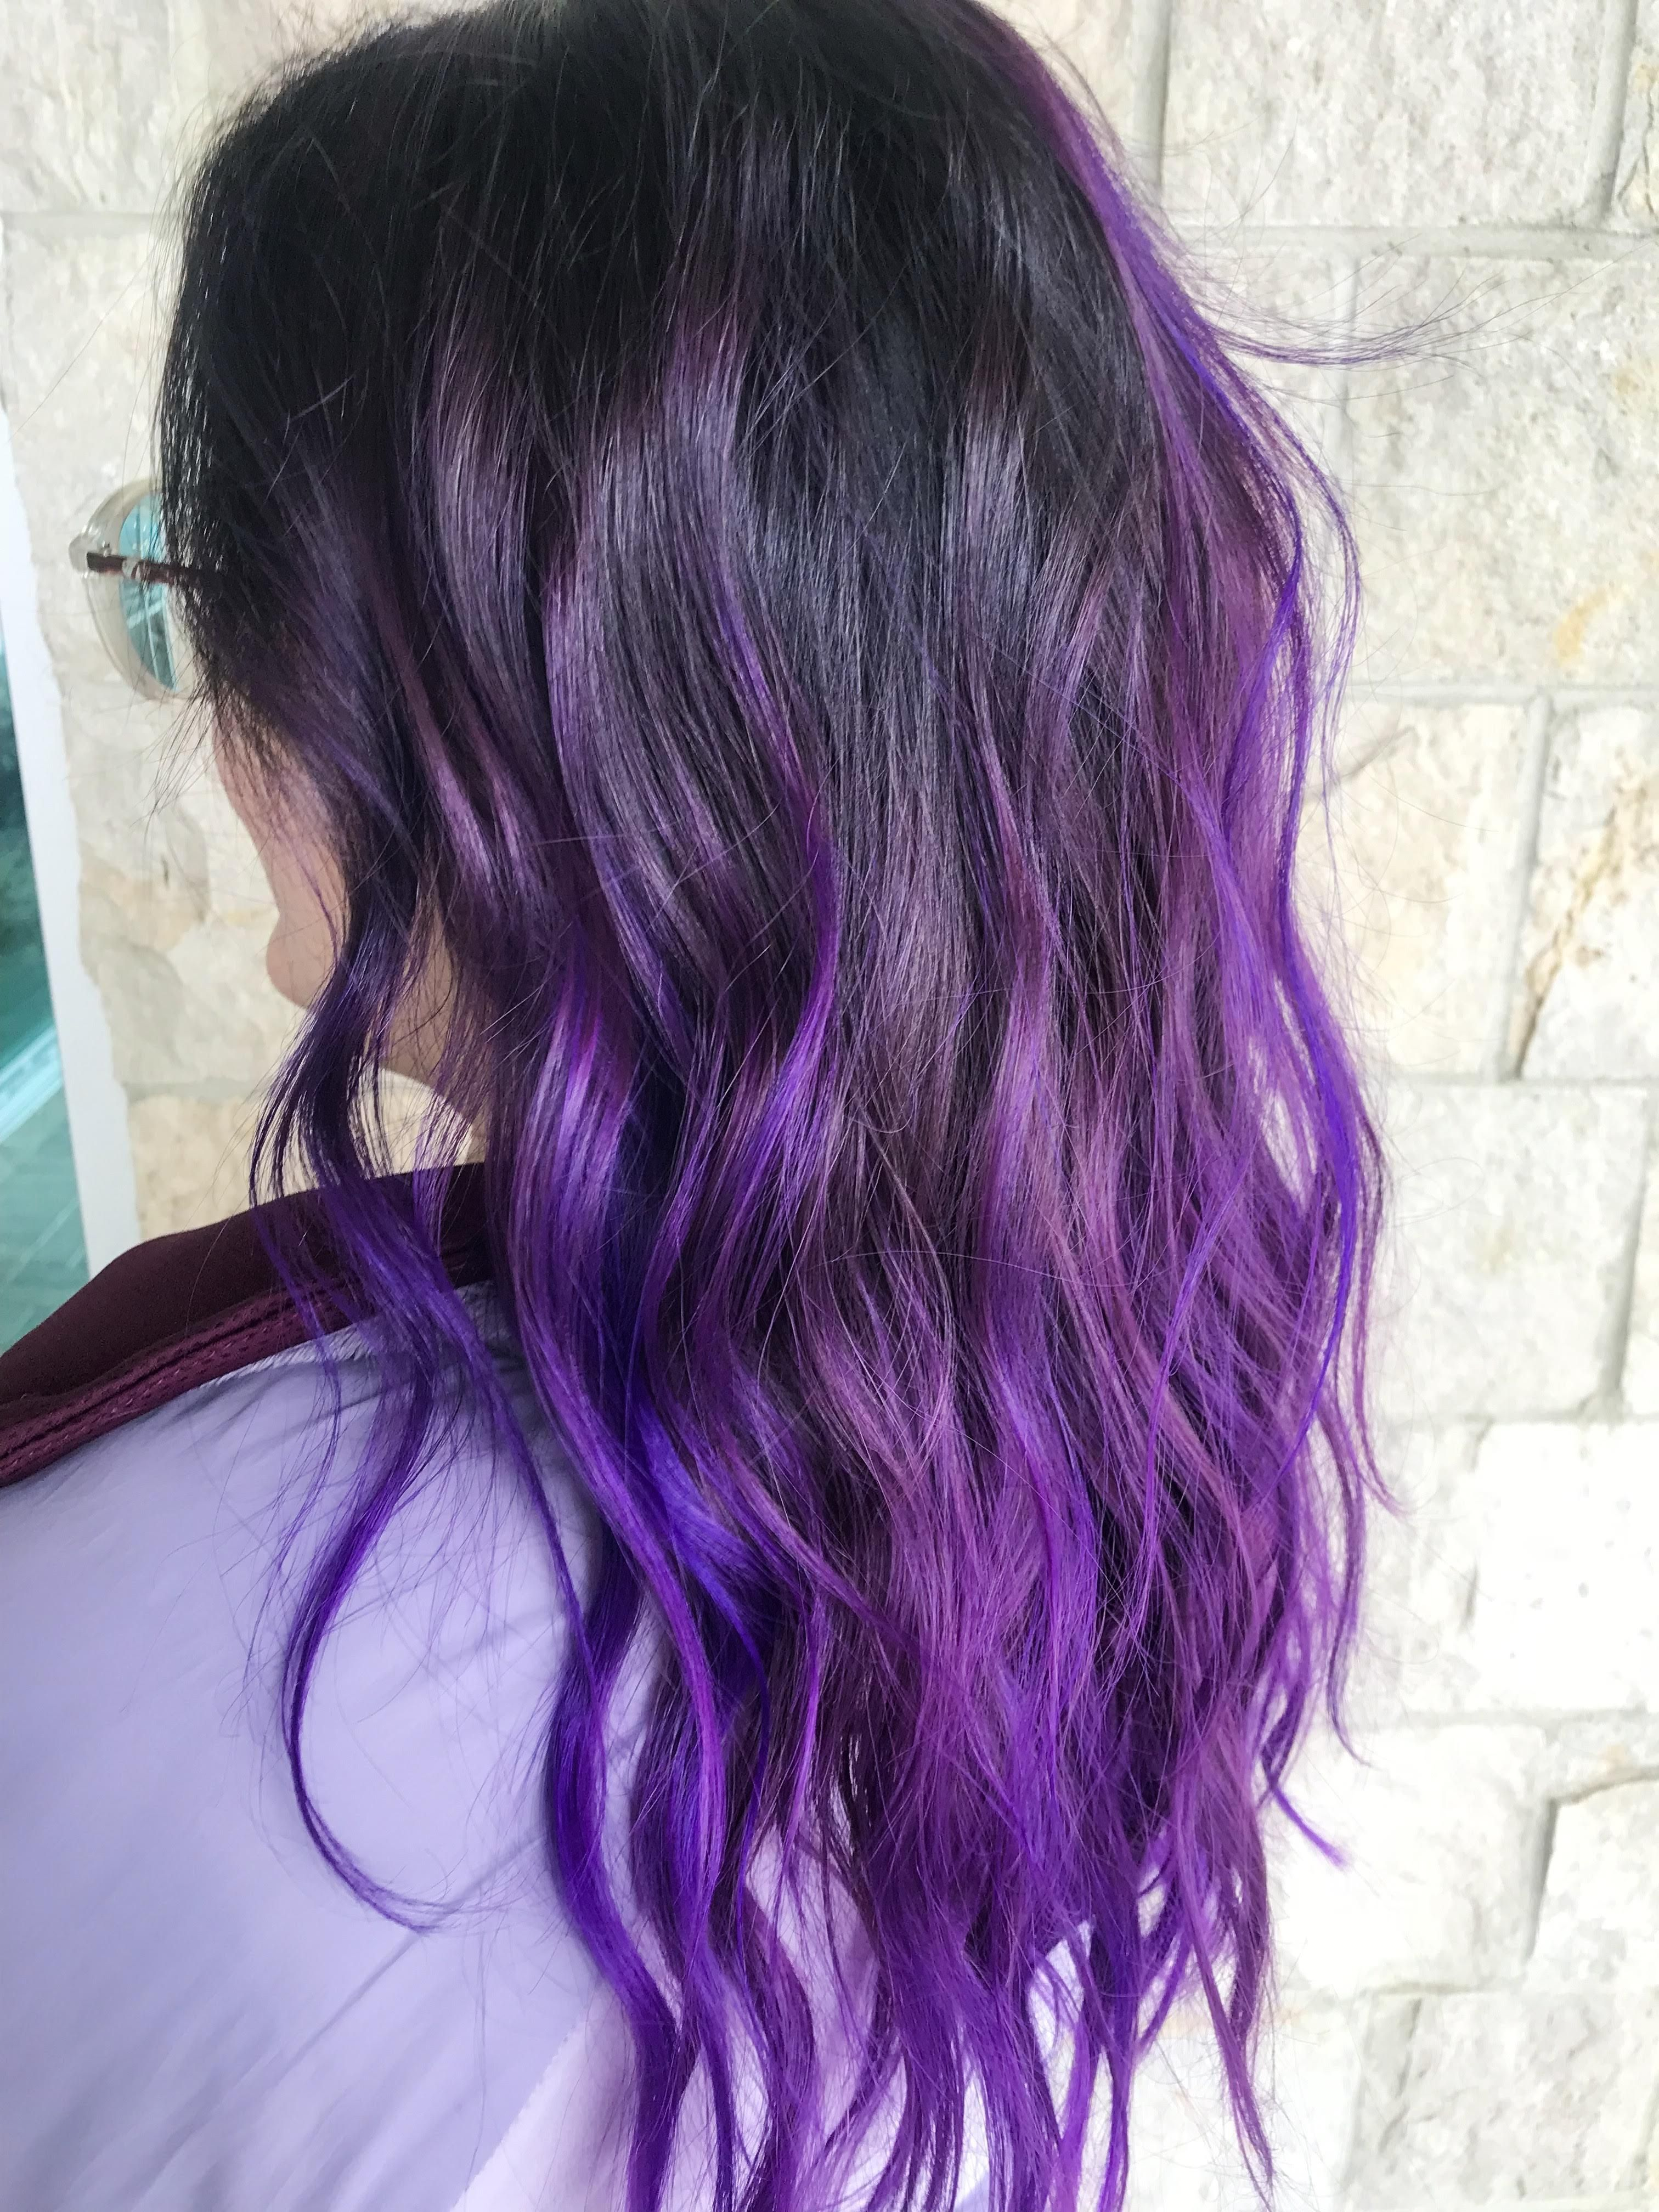 Arctic Fox Purple Rain Balayage I Did A Couple Days Ago Hair Beauty Skin Deals Me Fashion Love Cute Purple Brown Hair Fox Hair Dye Purple Ombre Hair